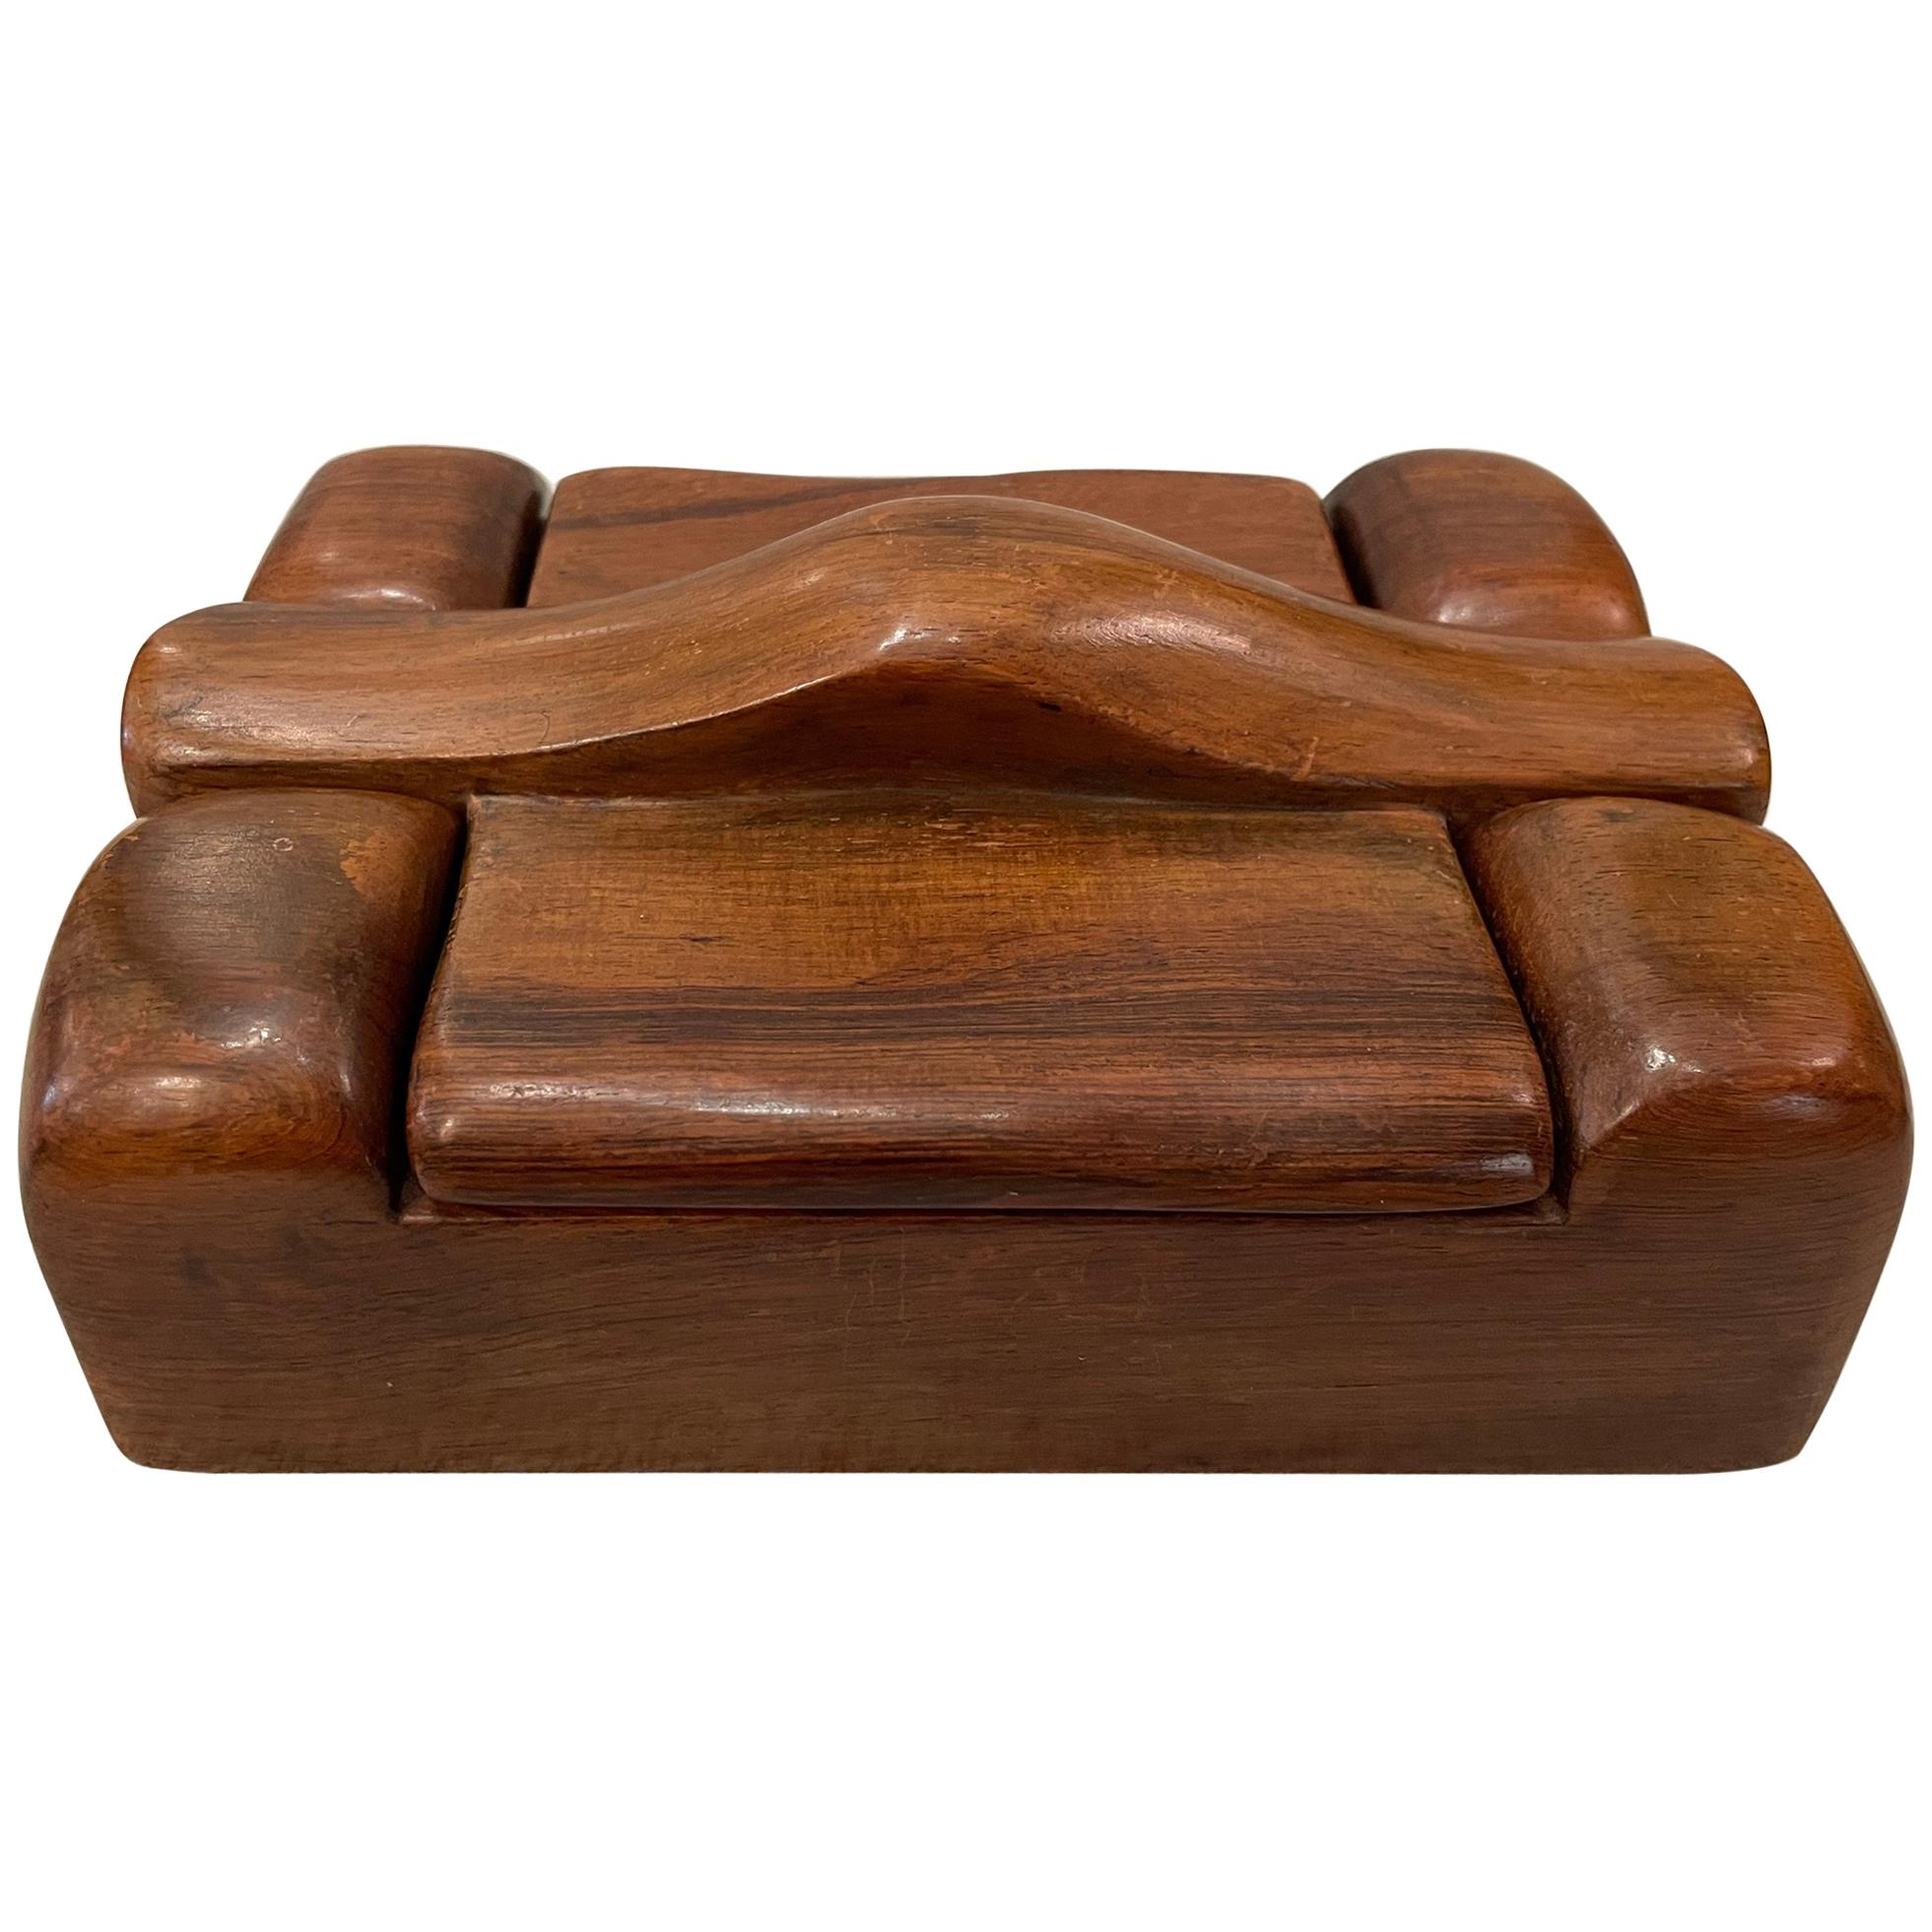 Alexandre Noll, Wood Box, circa 1950, France 'Signed'